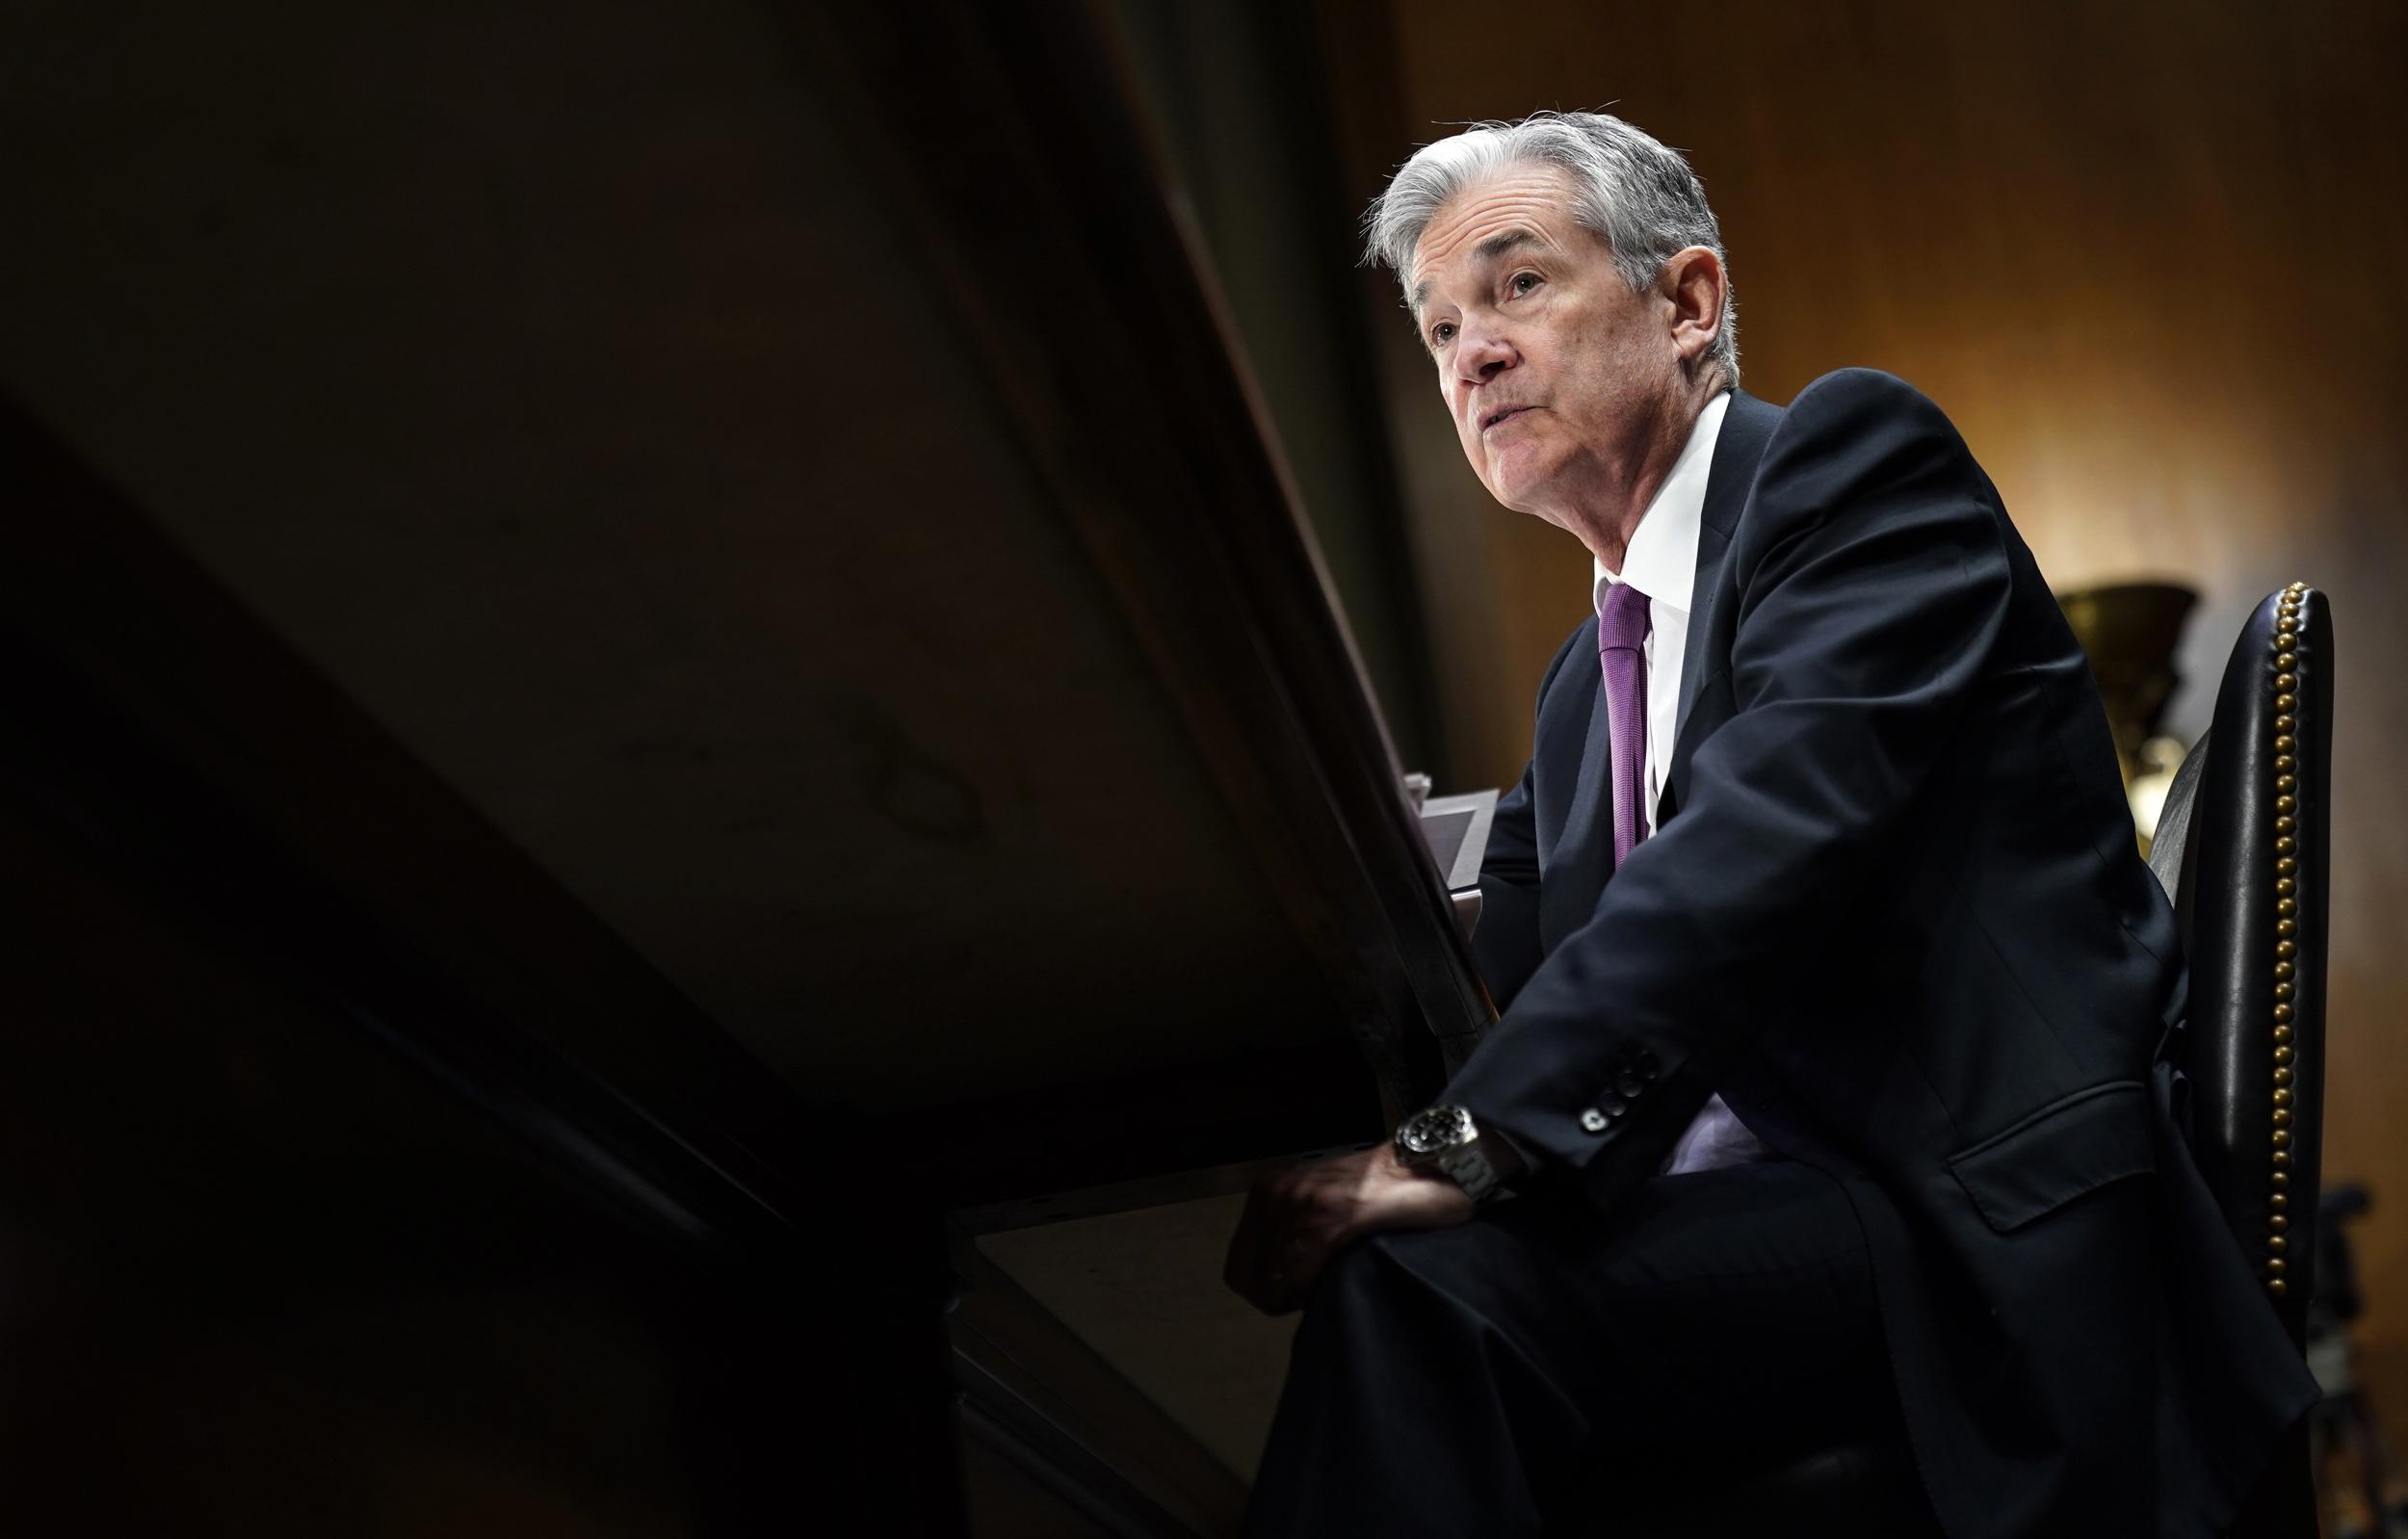 Wall Street awaits latest Fed decision on rate hike amid global slowdown